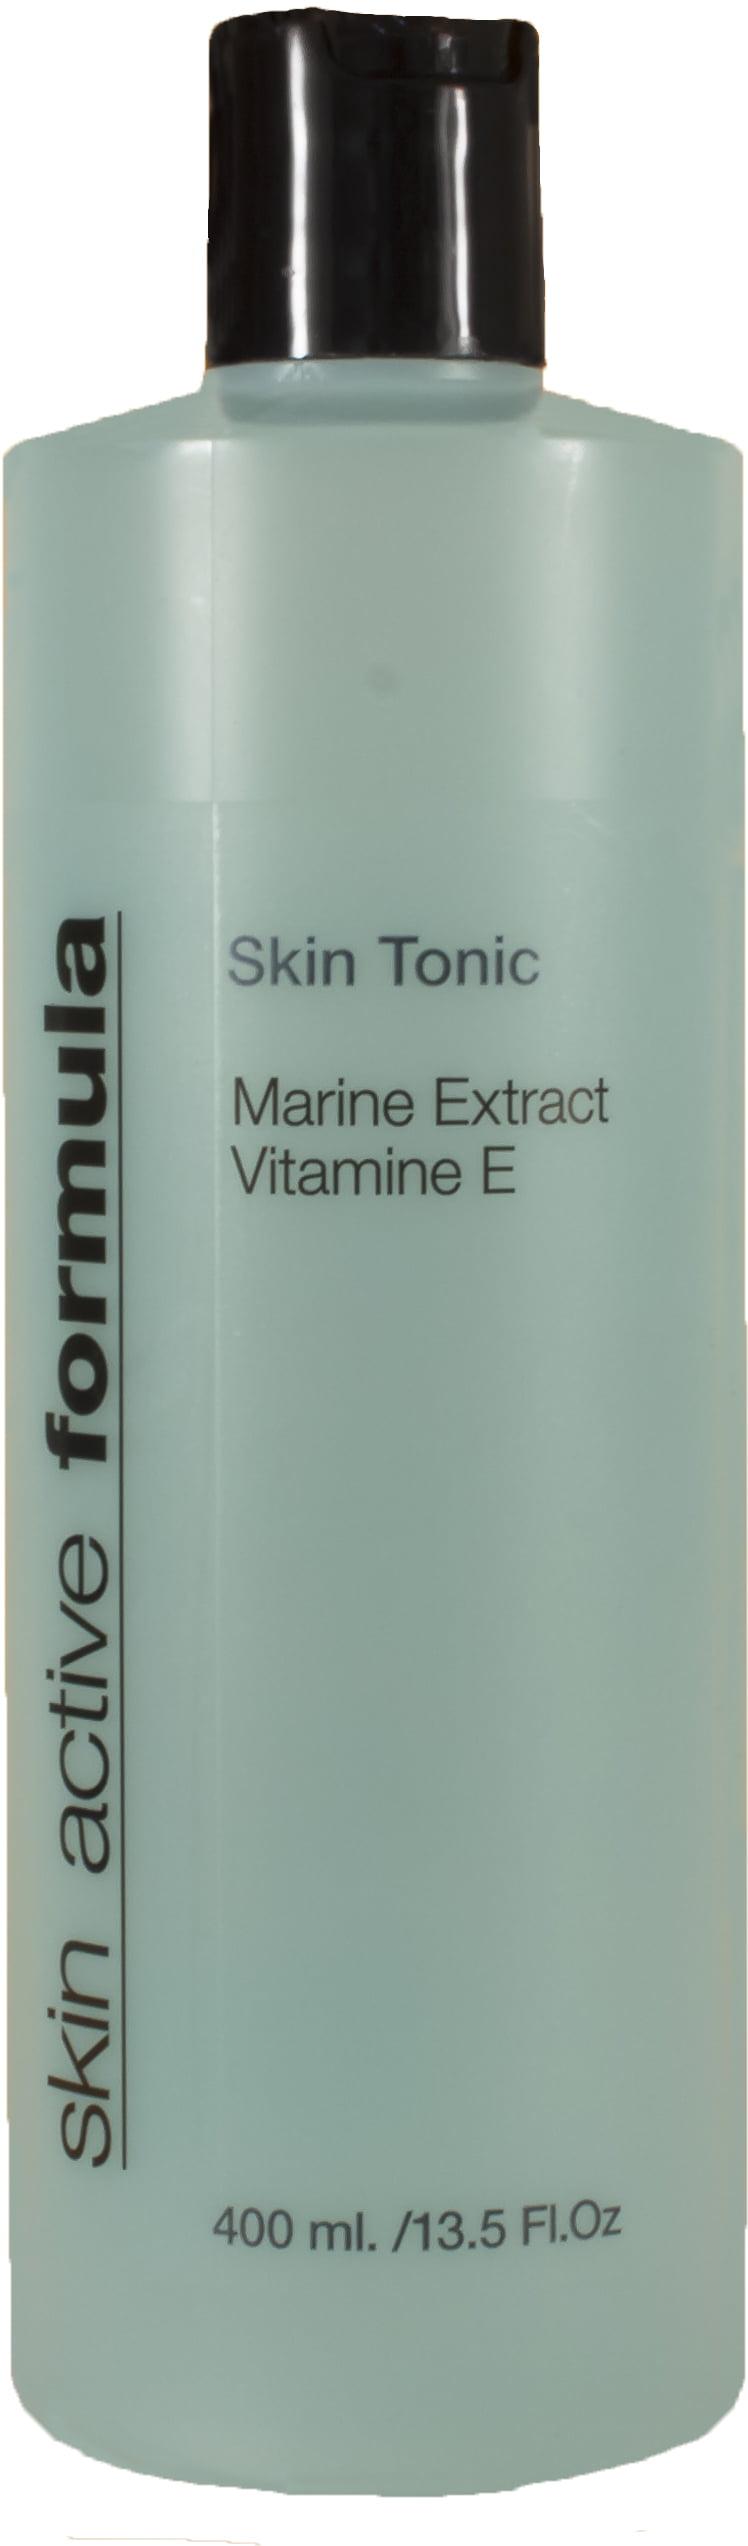 Skin Active Formula Skin Tonic 400 ml – Marine Extract – Vitamin E